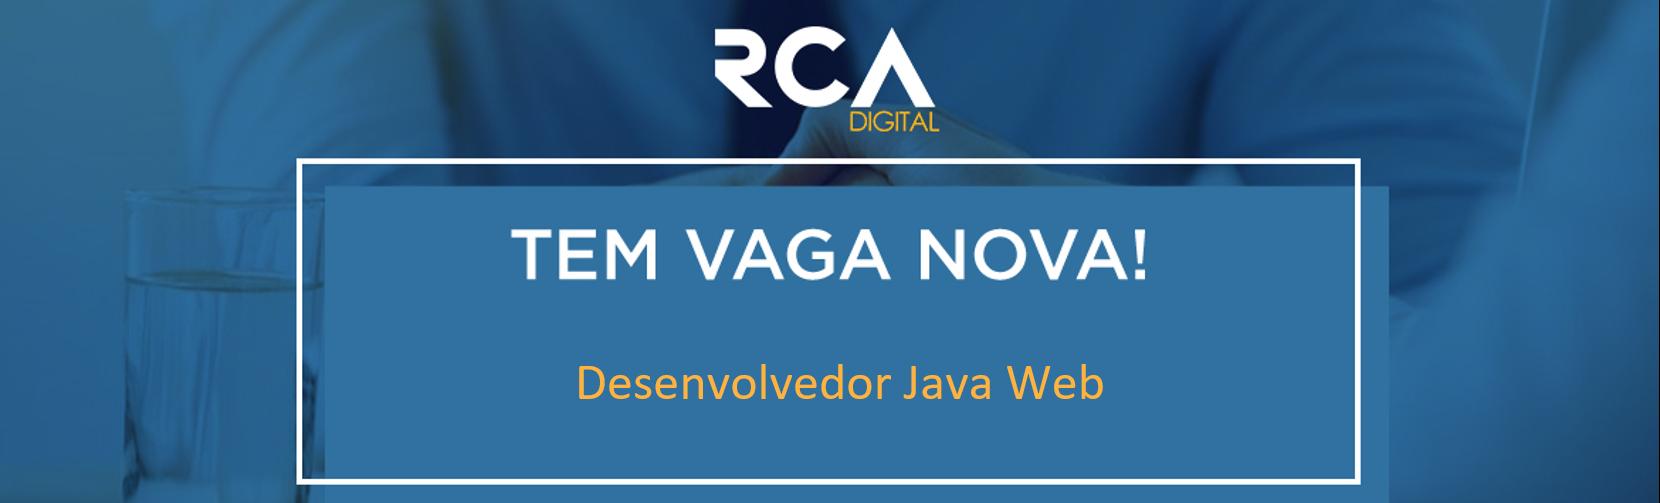 [RCA] - Desenvolvedor Java Web Pleno